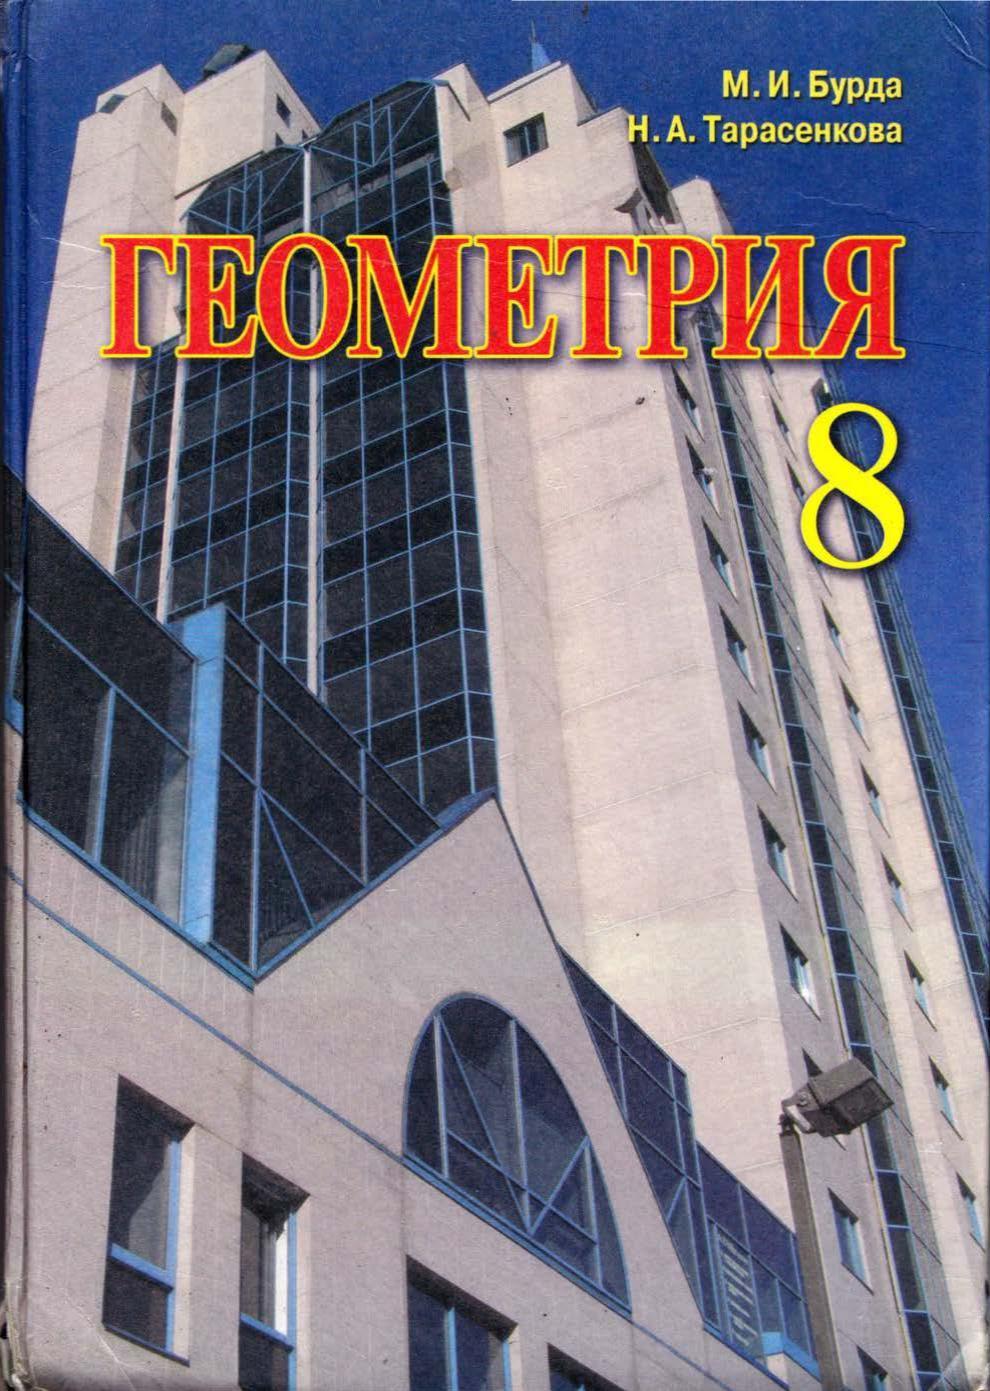 Гдз 8 класс геометрия бурда тарасенкова 2008 hadeltili1982's blog.